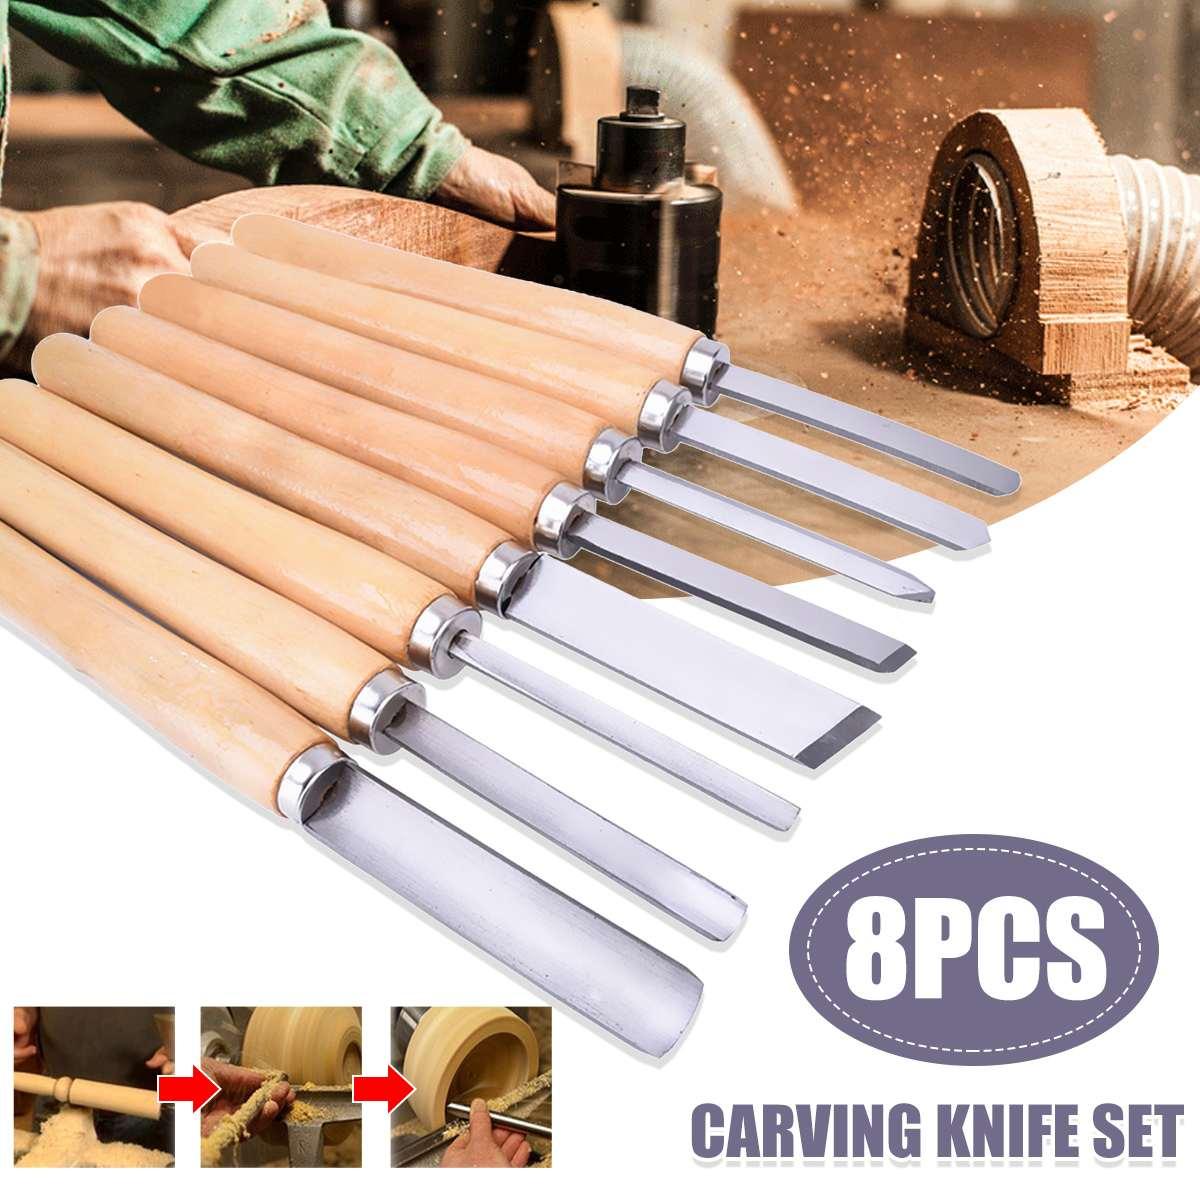 8Pcs/Set Woodworking Carving Chisel Knives Set Turning Tools Wood Craft Gouge Skew Parting Detail Chisel Handle Sculpture Knives